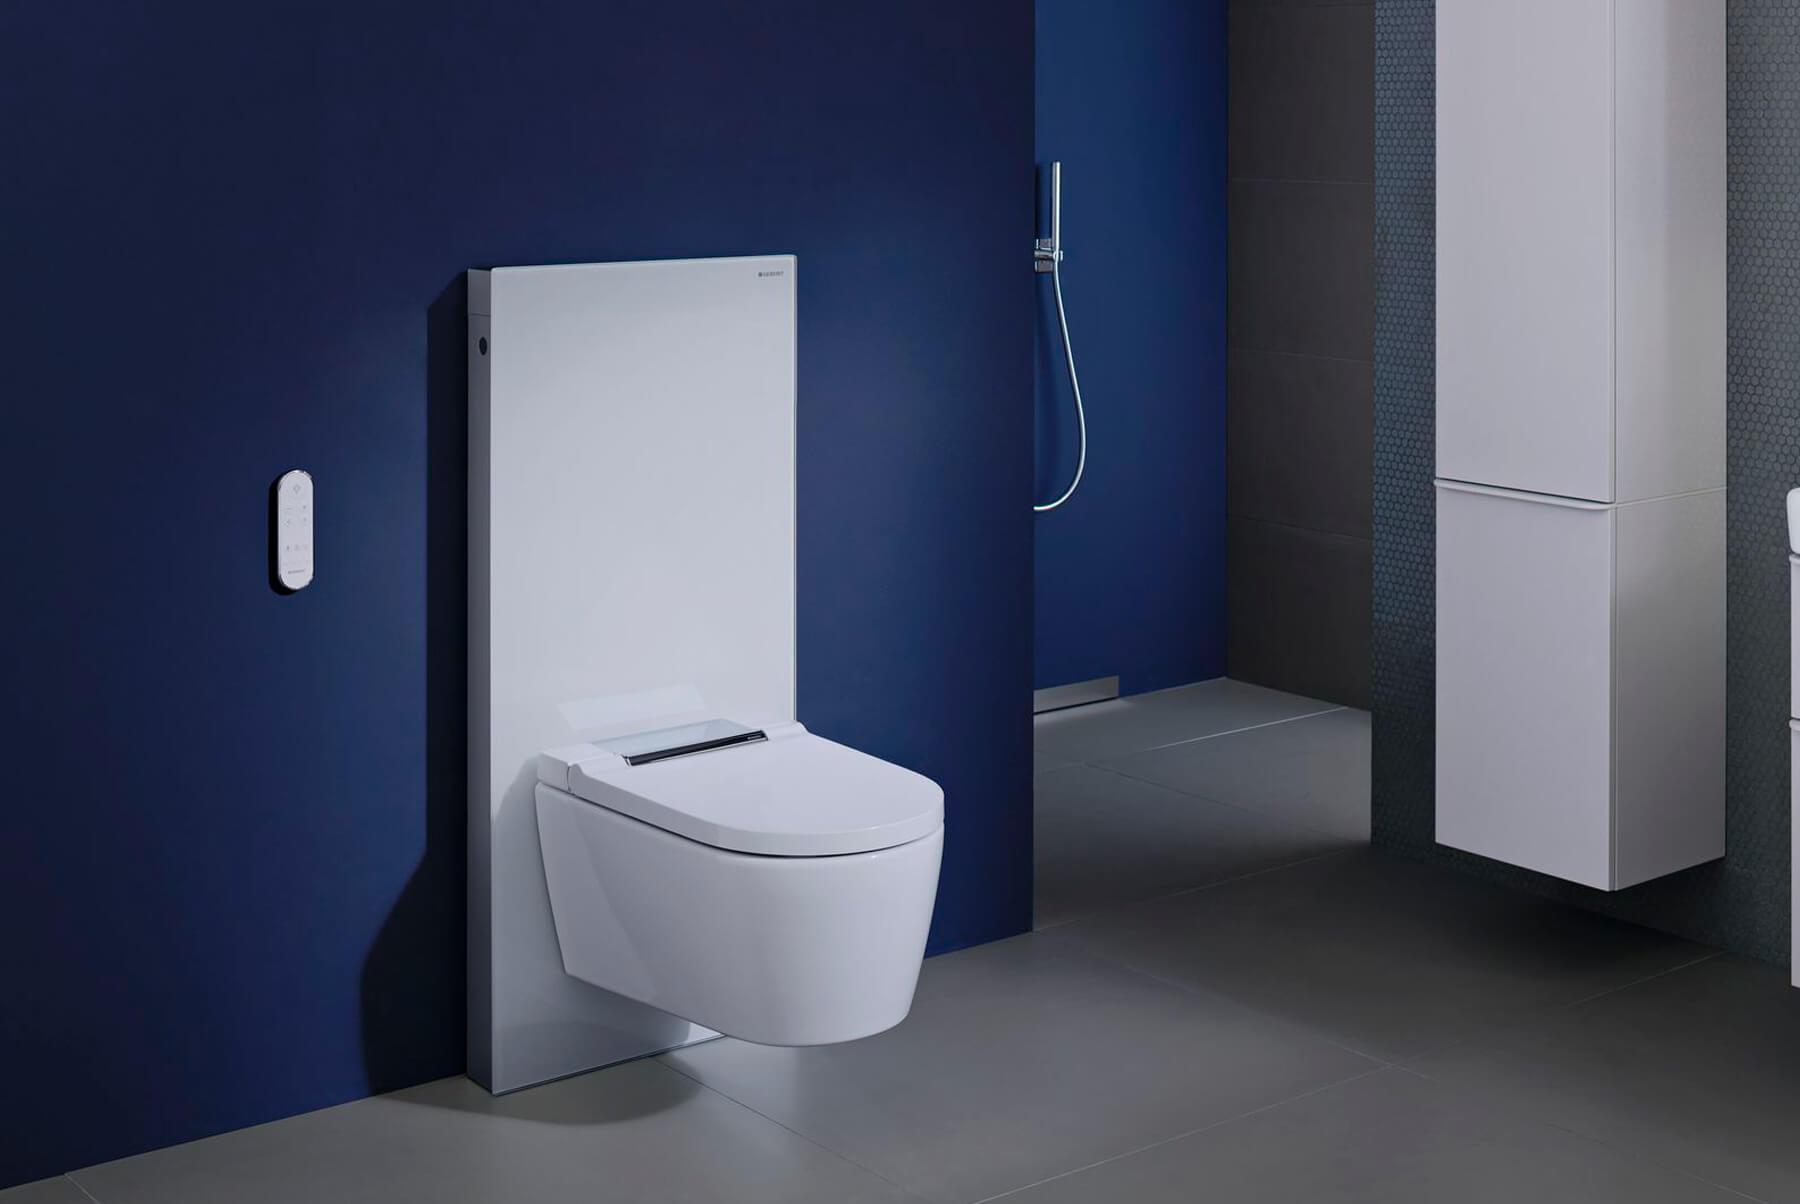 WC-&-WASHLETS-GEBERIT-AQUACLEAN-INSET-4-1800x1204